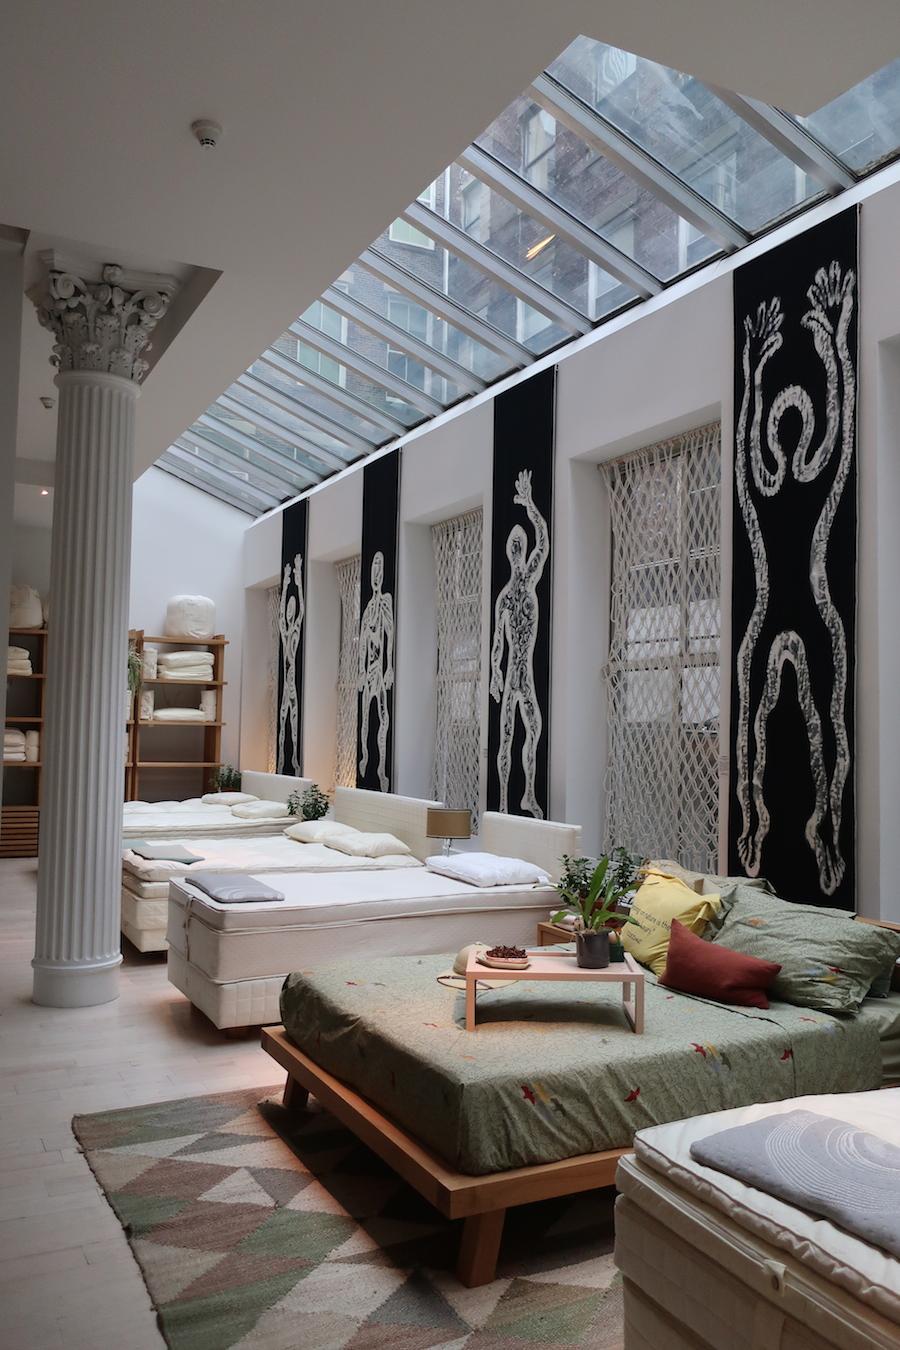 en mat athens empiria coco a hotel experience complete filoxenias hospitality olokliromeni